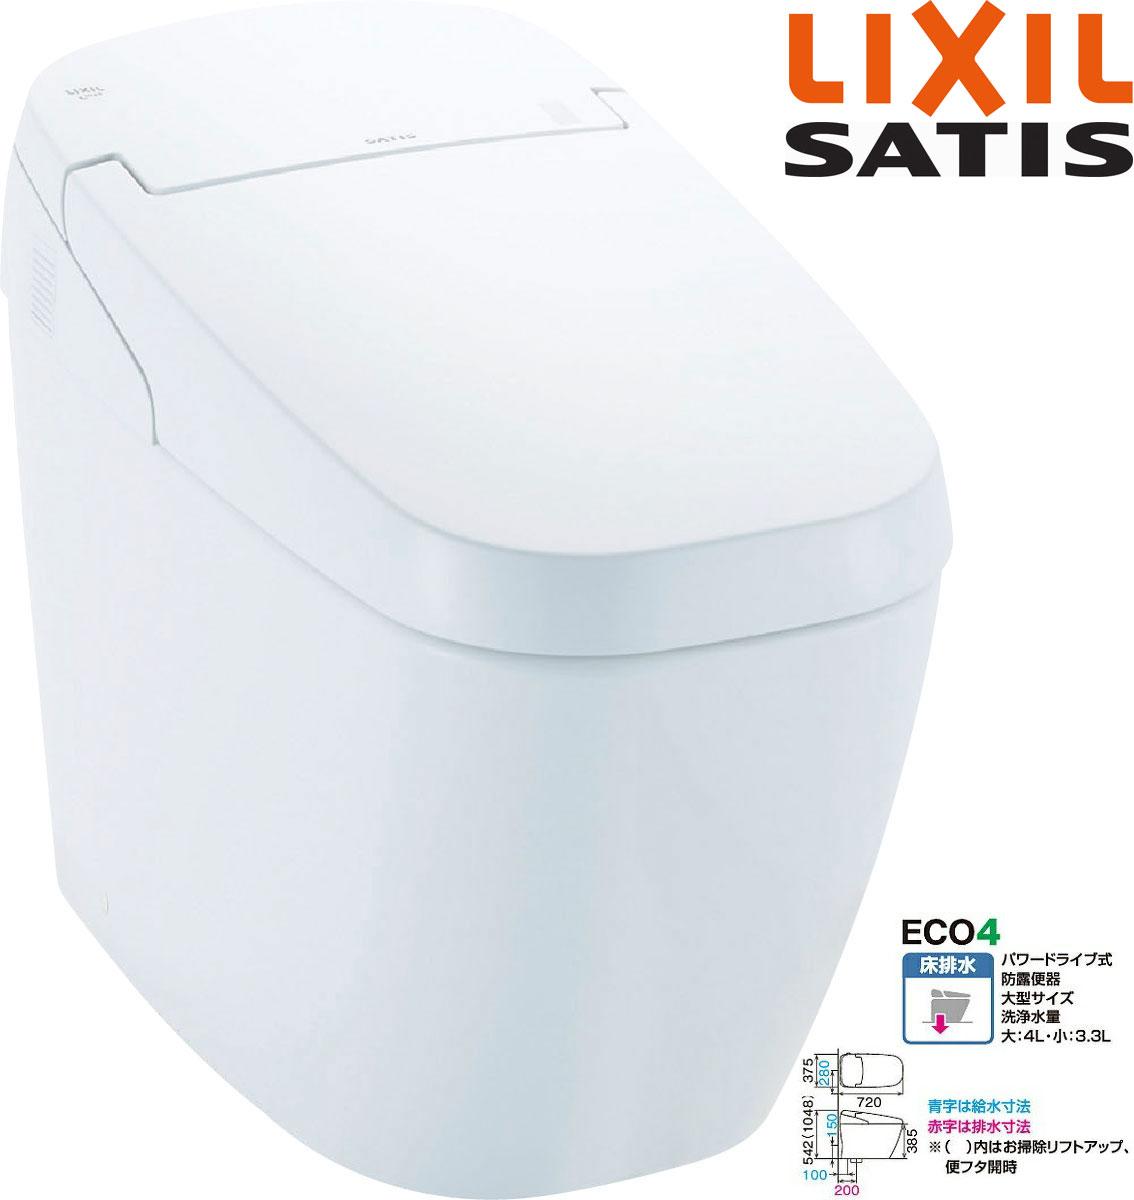 LIXIL(INAX) サティスGタイプ ECO4 床排水 G6 YBC-G20S+DV-G216